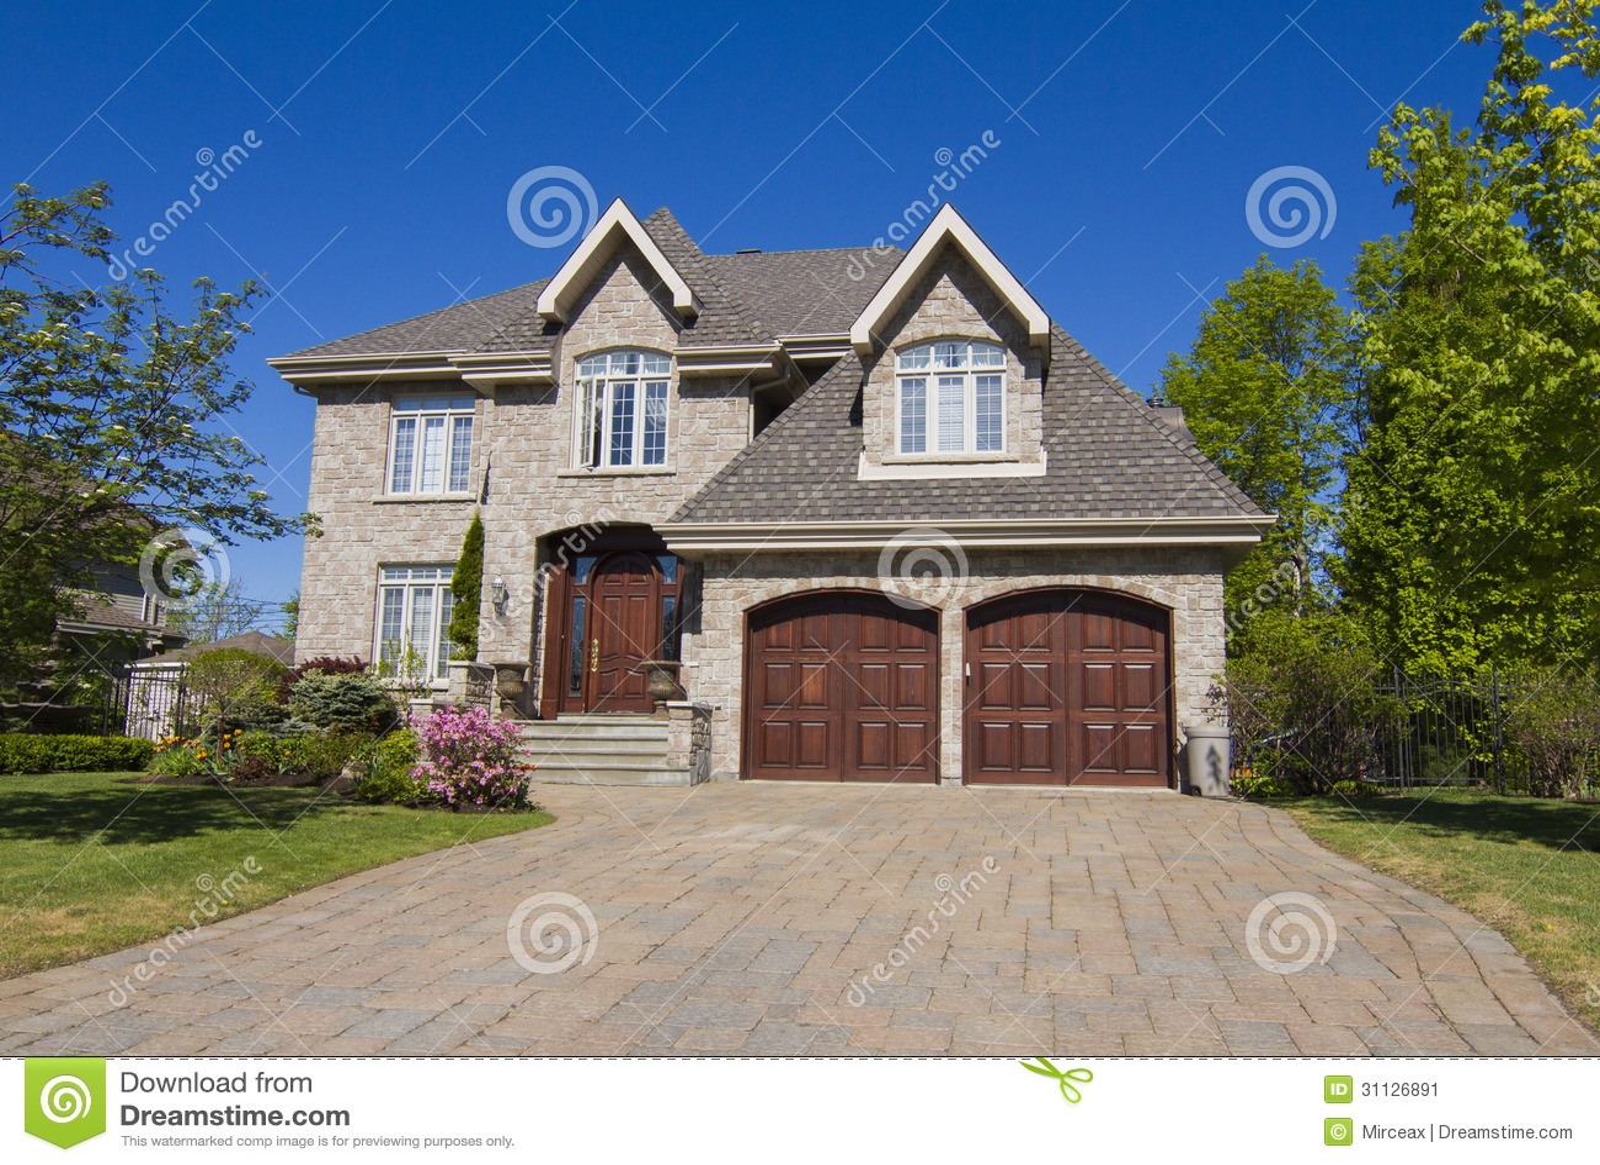 Stock image big house image 31126891 for New house big